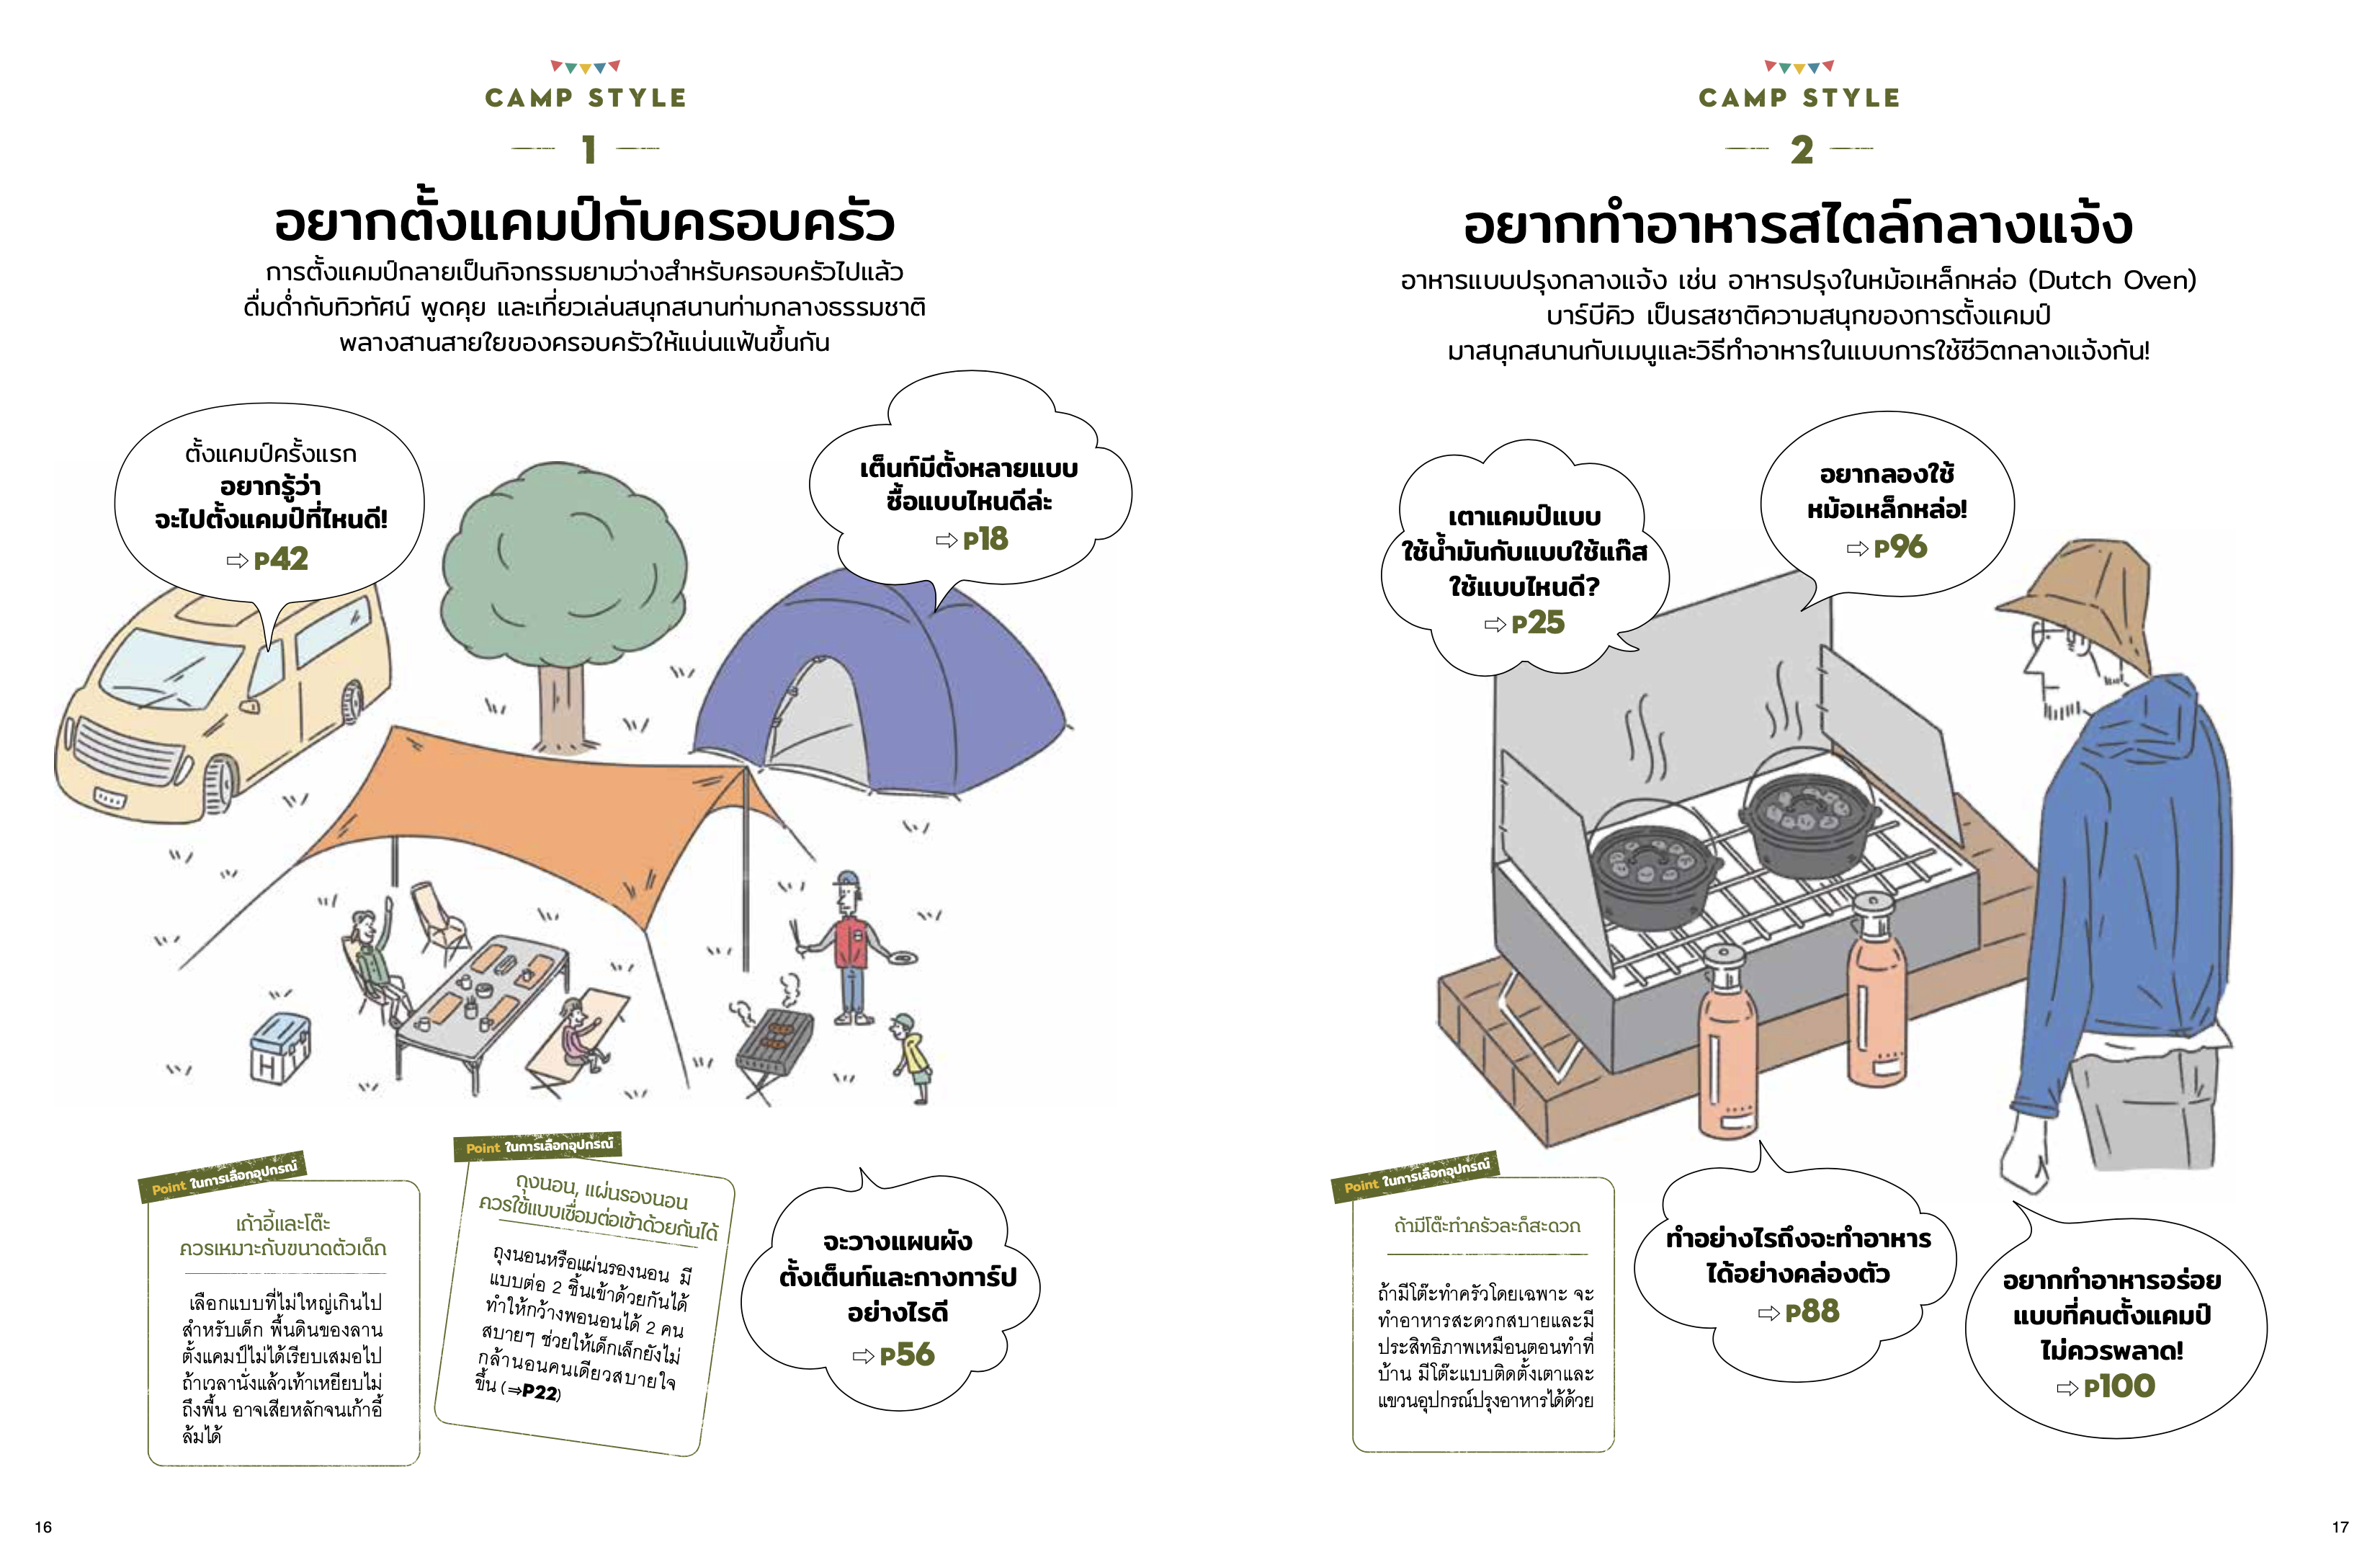 Camping Handbook คู่มือตั้งแคมป์สไตล์ญี่ปุ่น